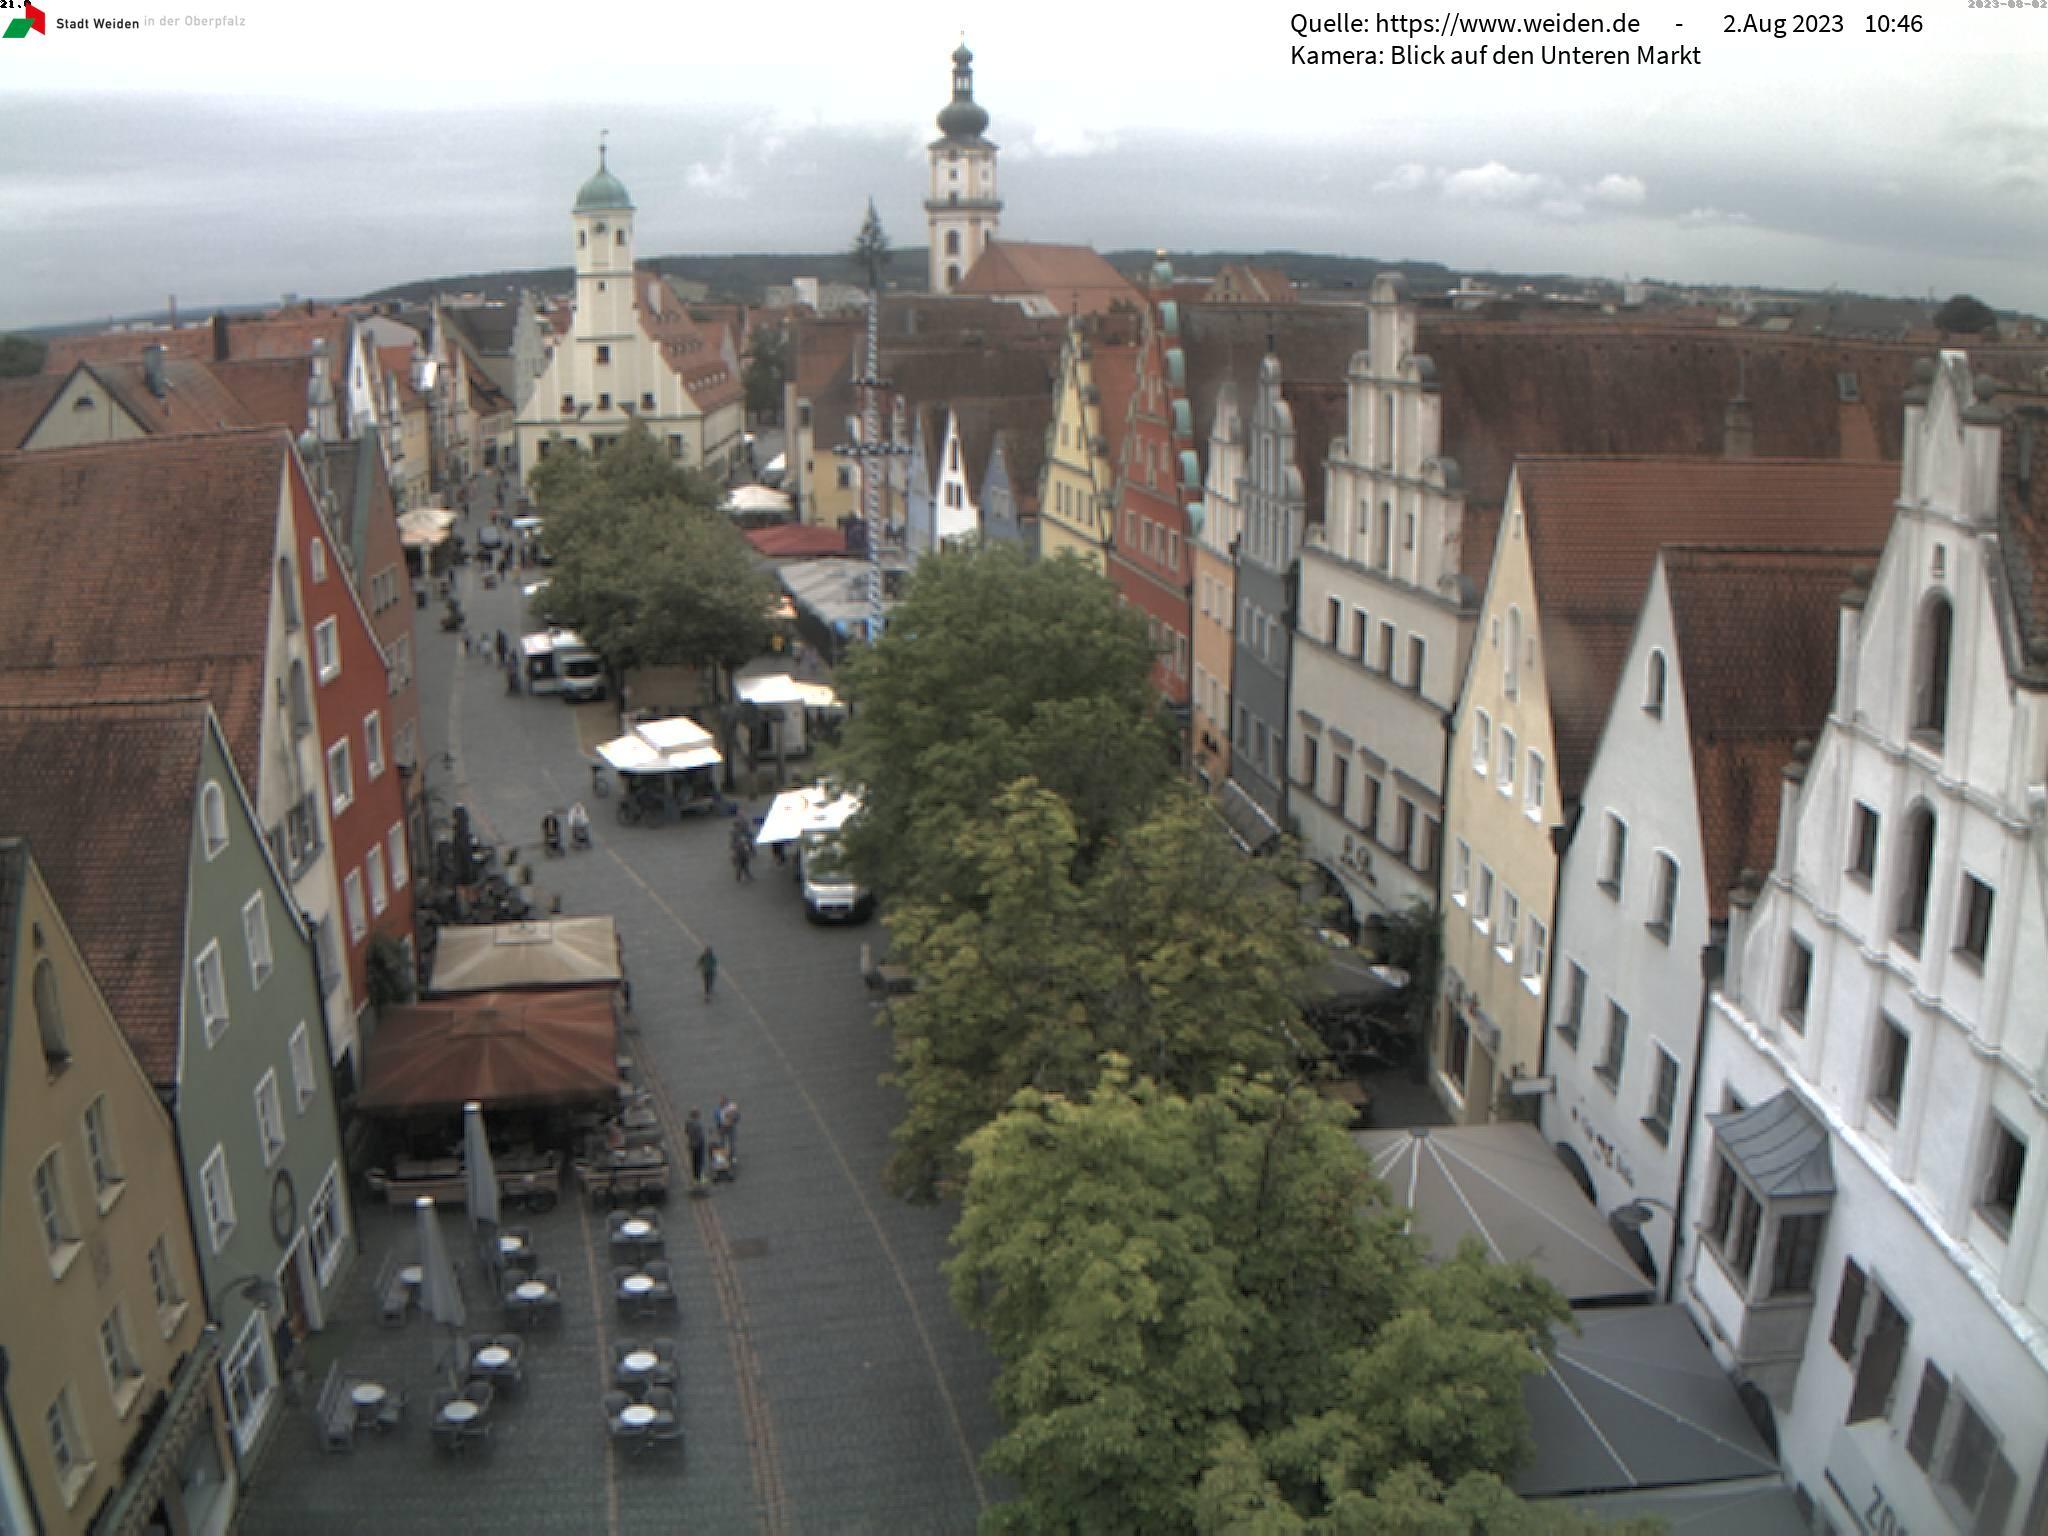 Webcam Unterer Markt